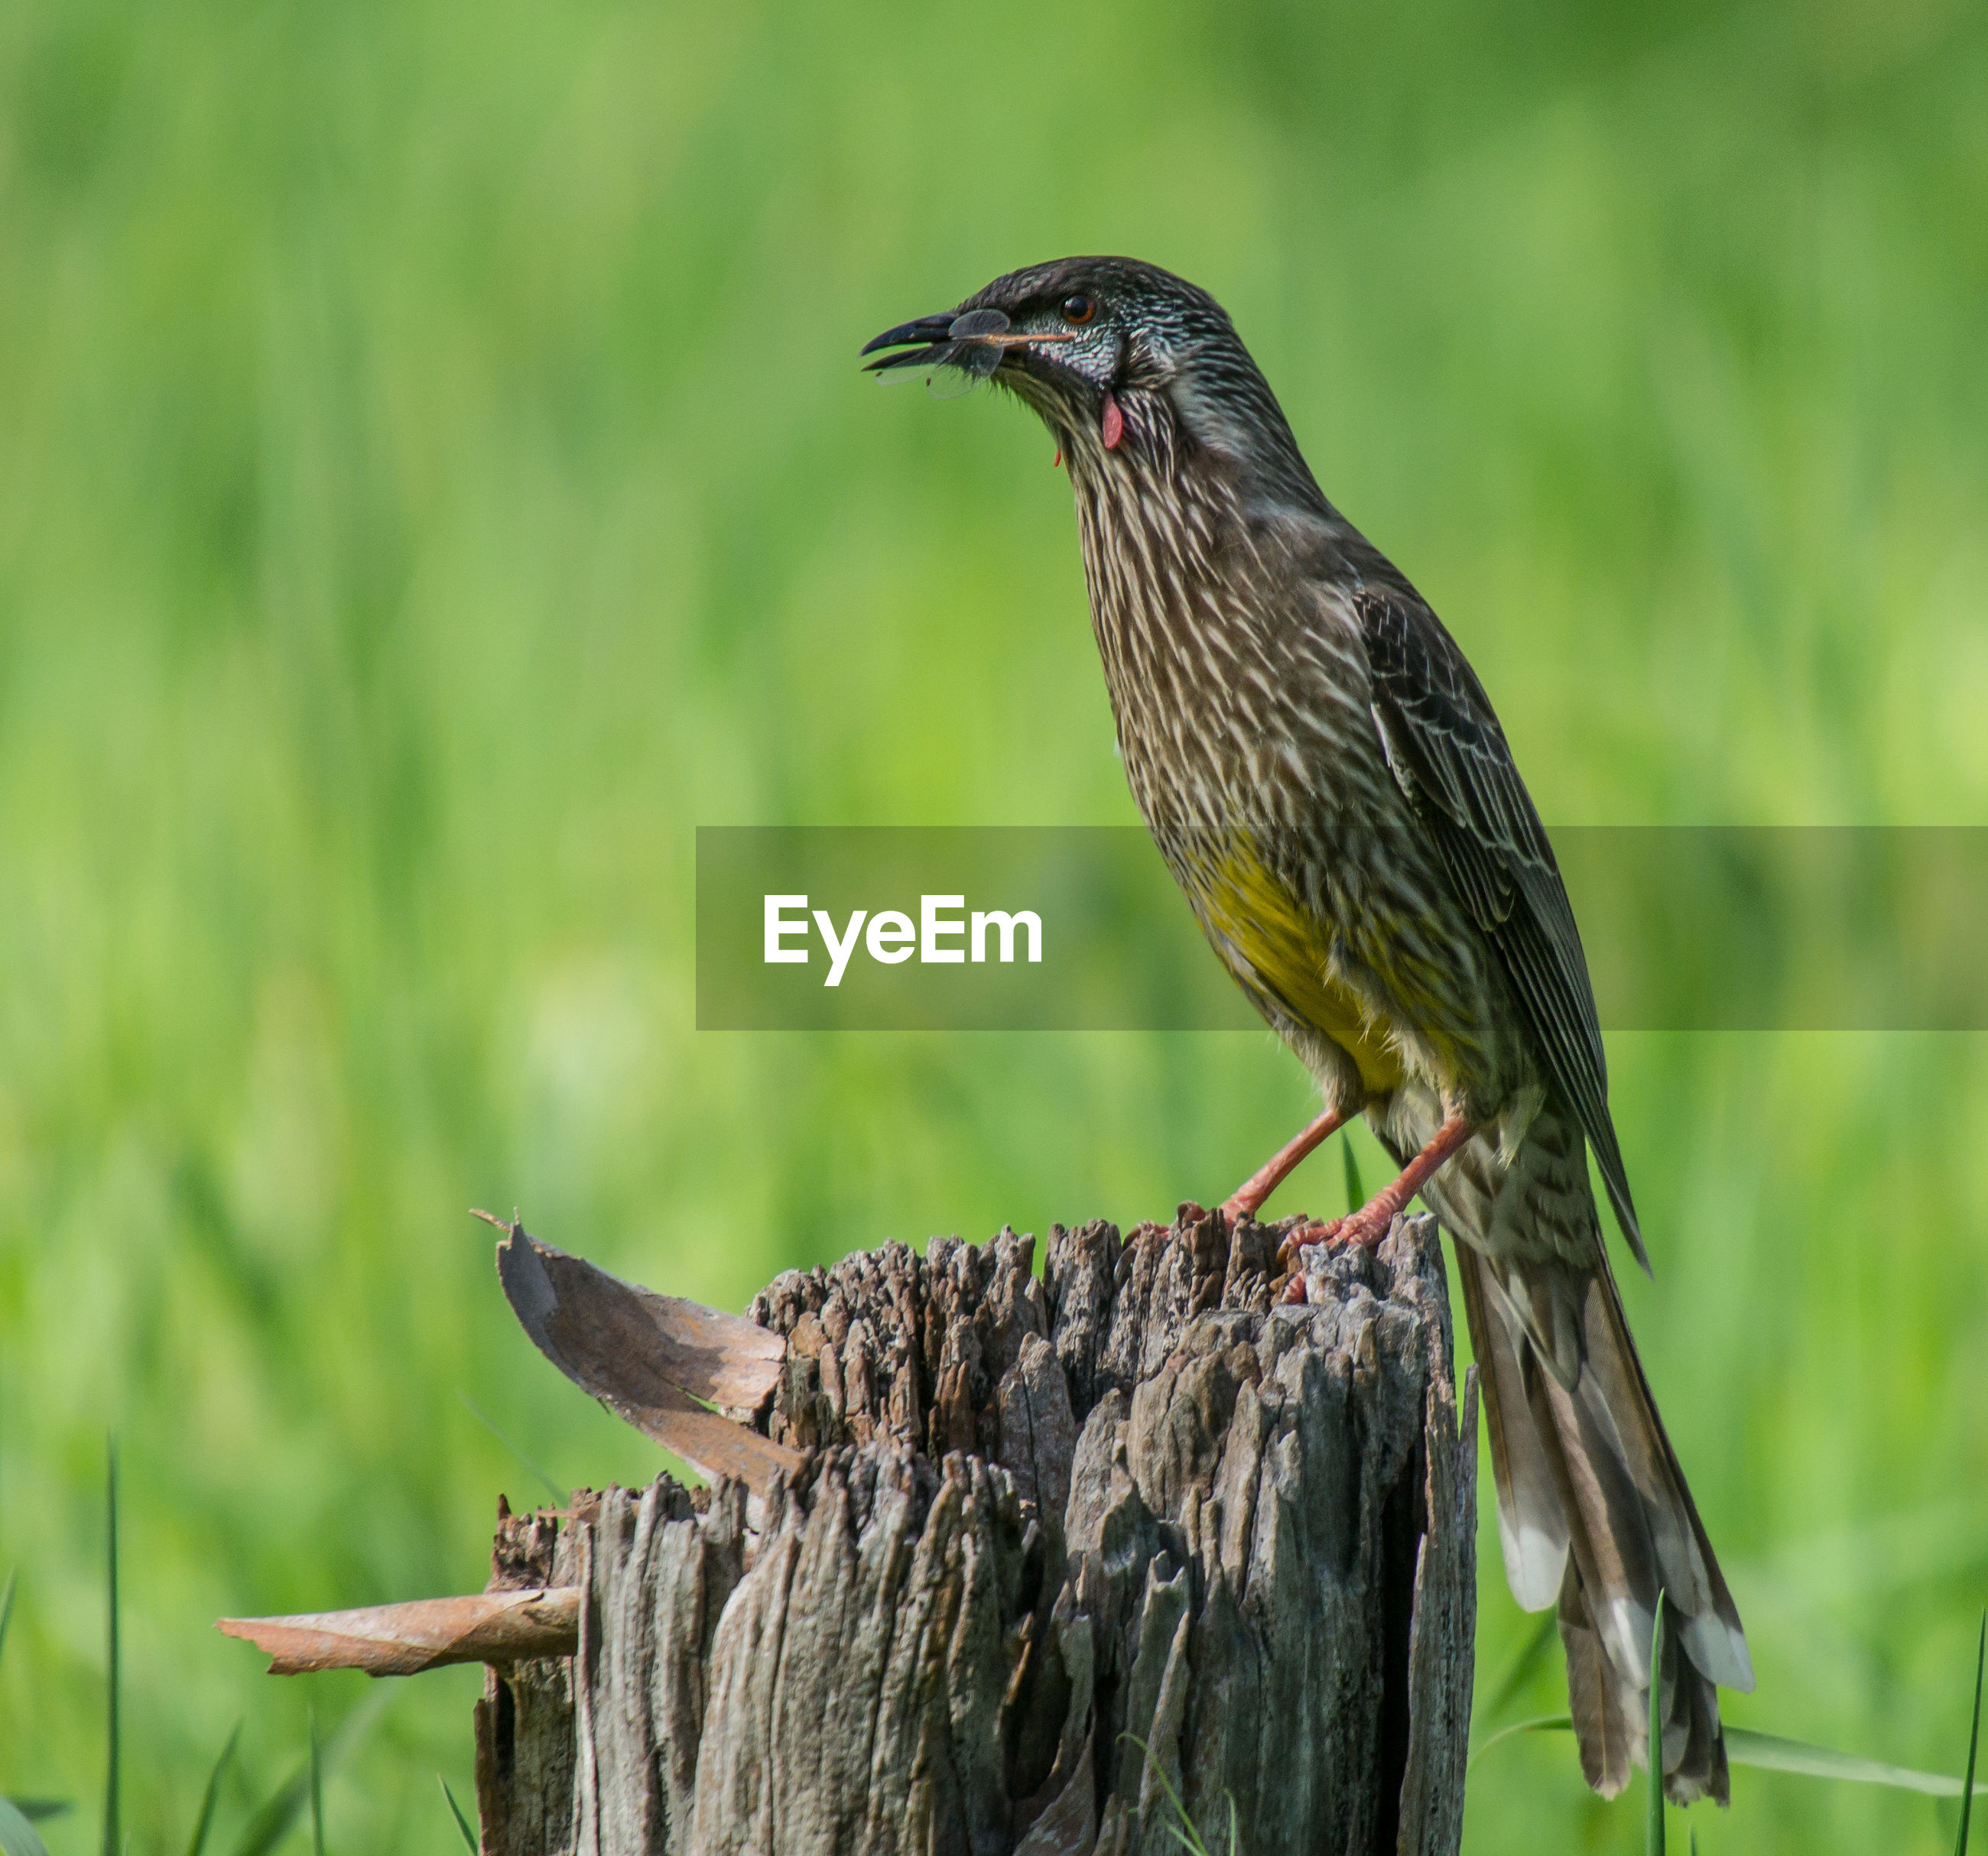 Wattlebird with prey in beak perching on weathered wooden post